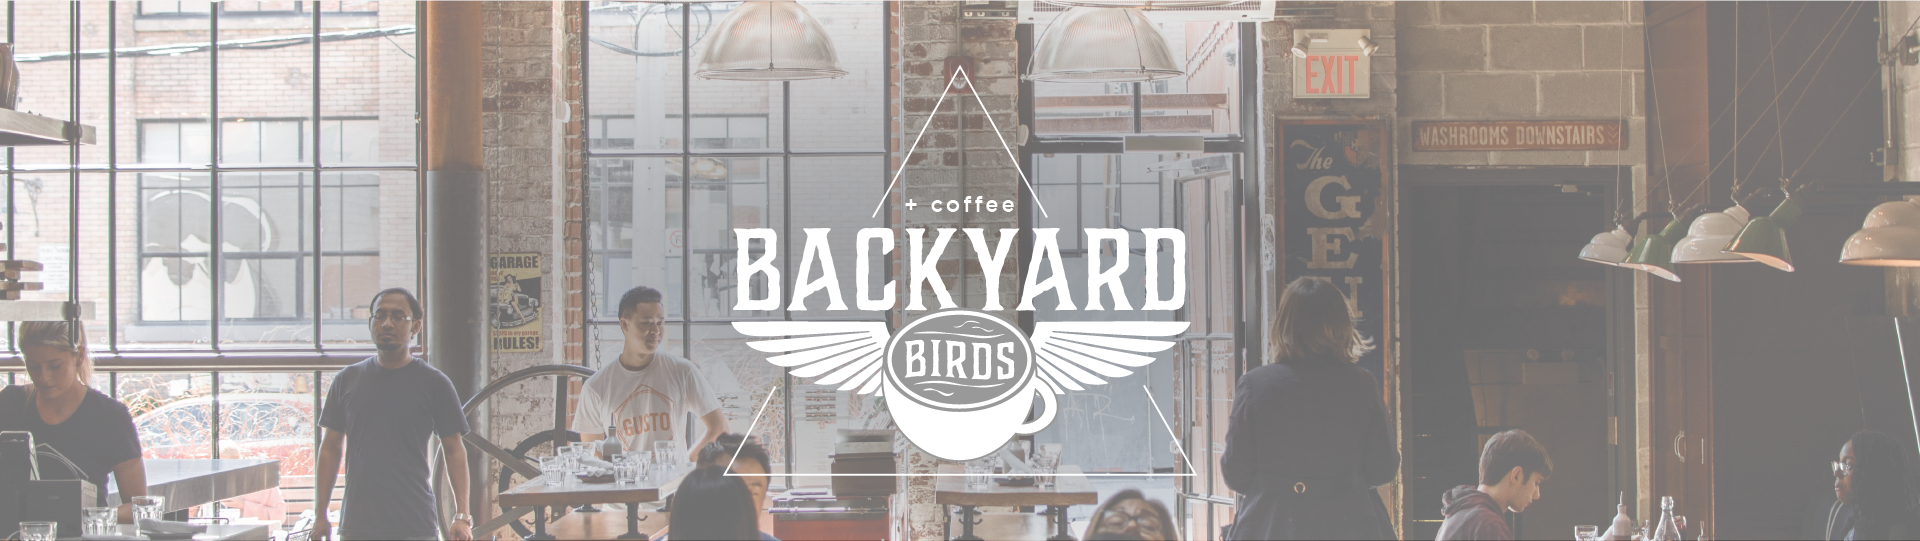 Backyard Birds + Coffee